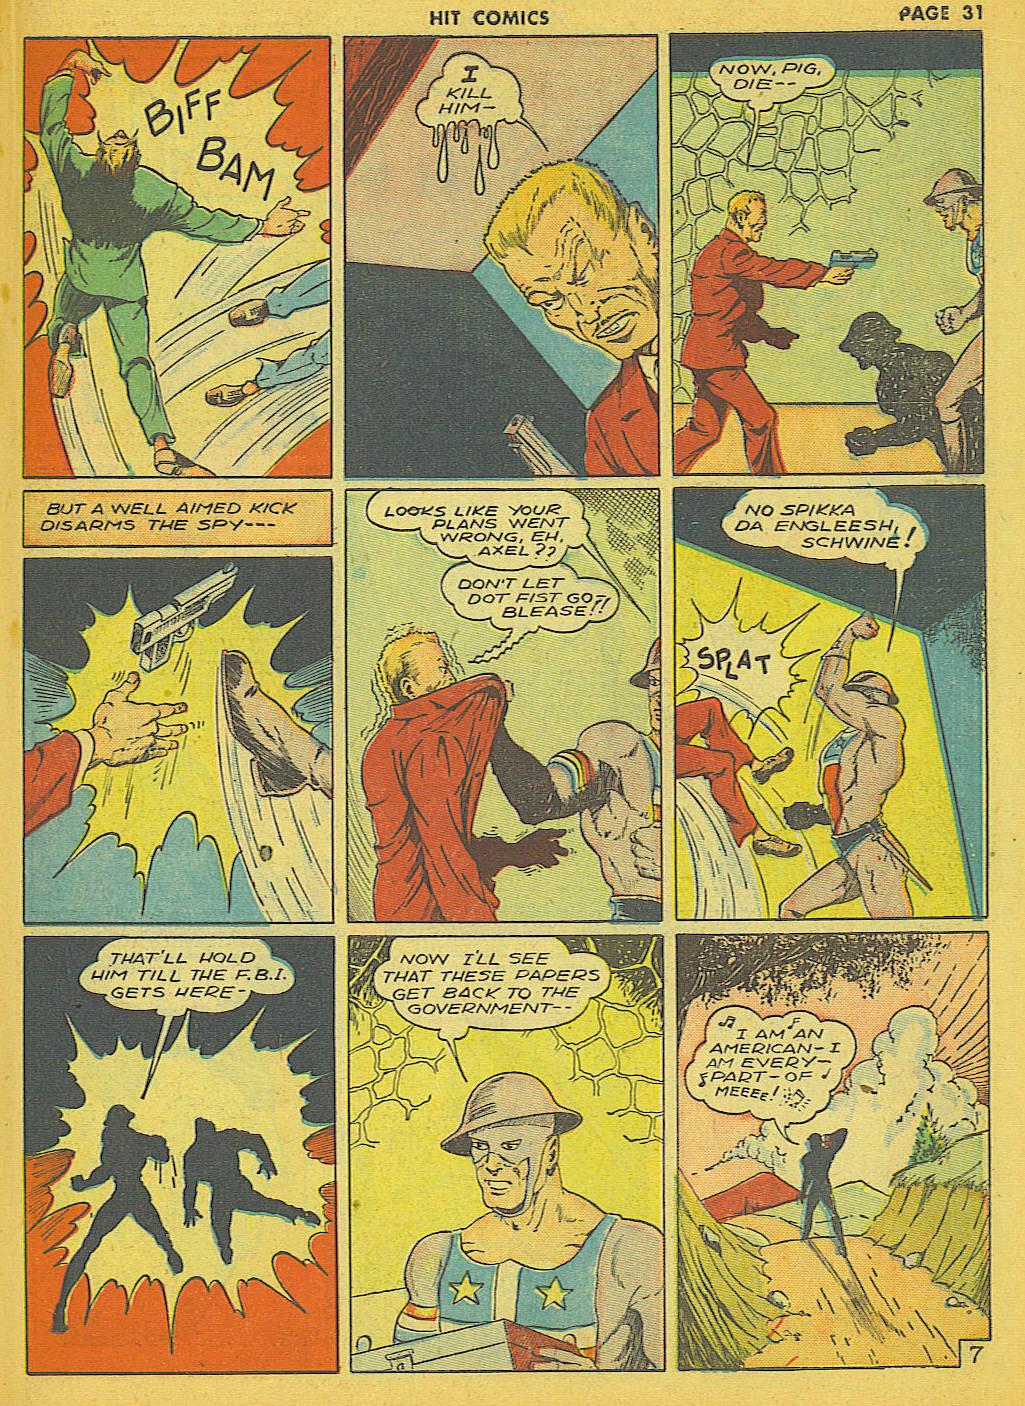 Read online Hit Comics comic -  Issue #21 - 33